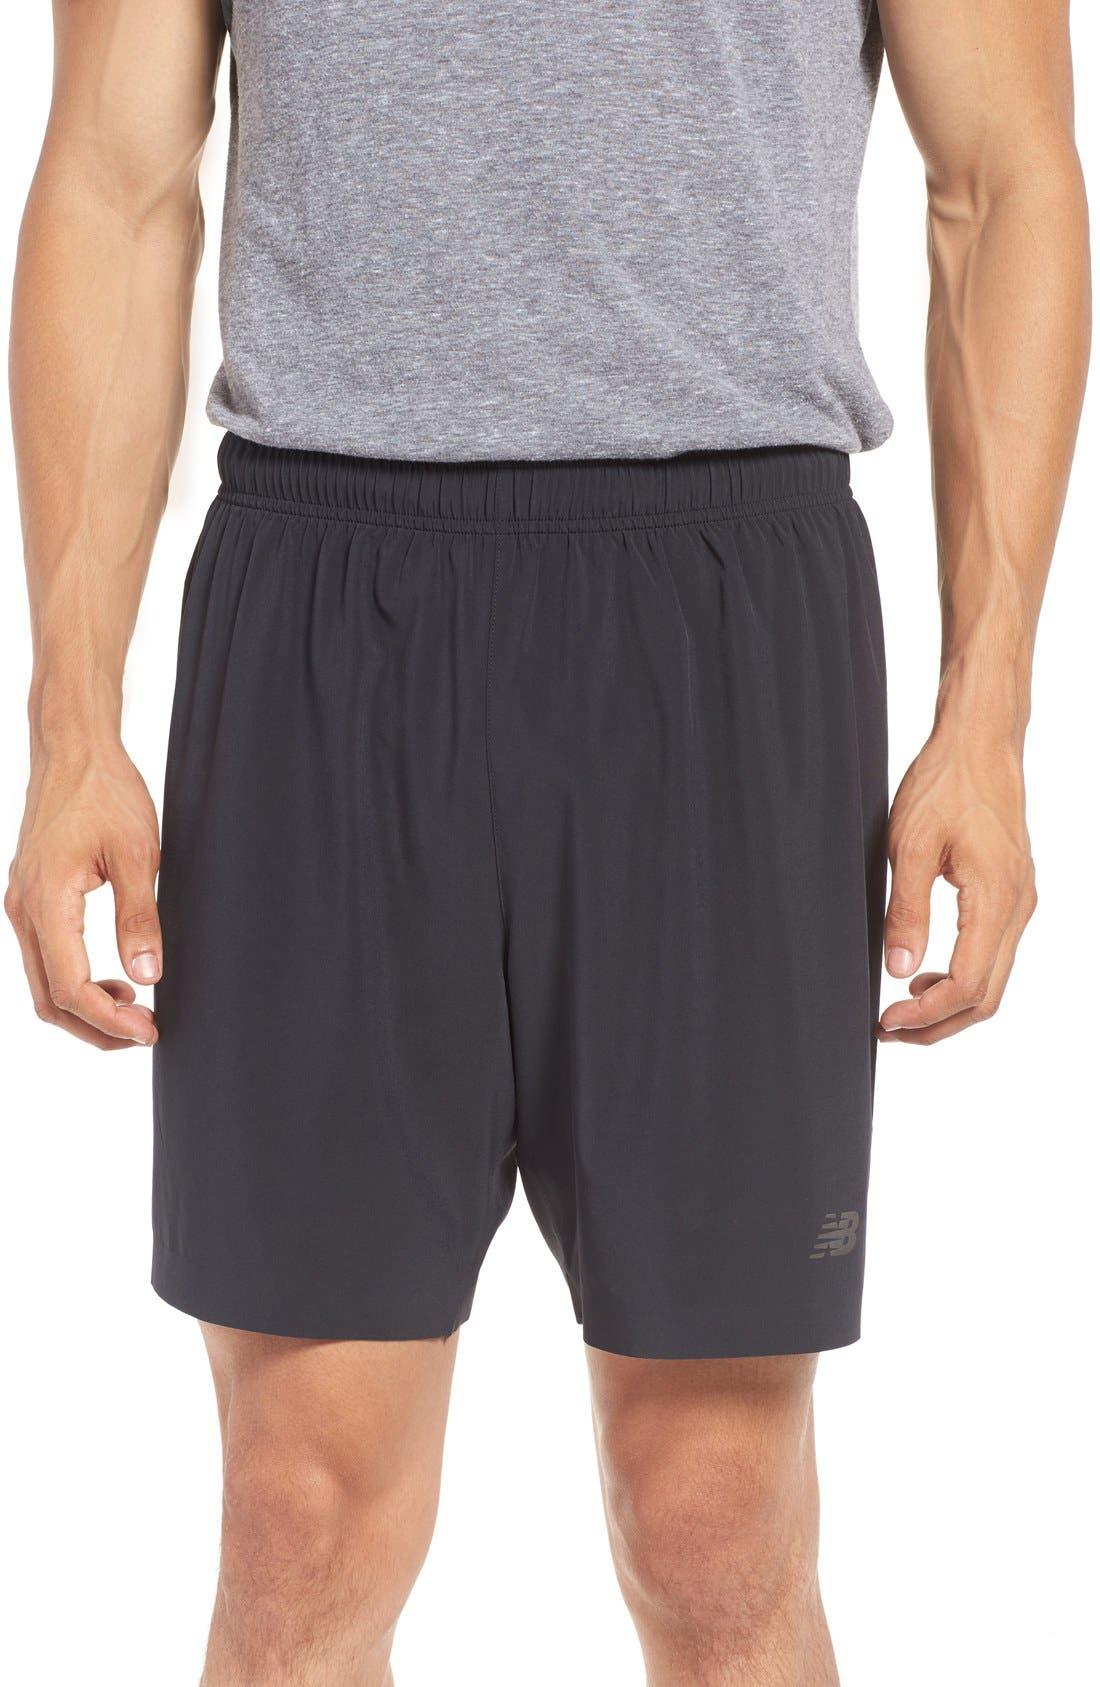 'Shift' Athletic Fit Training Shorts,                             Main thumbnail 1, color,                             001